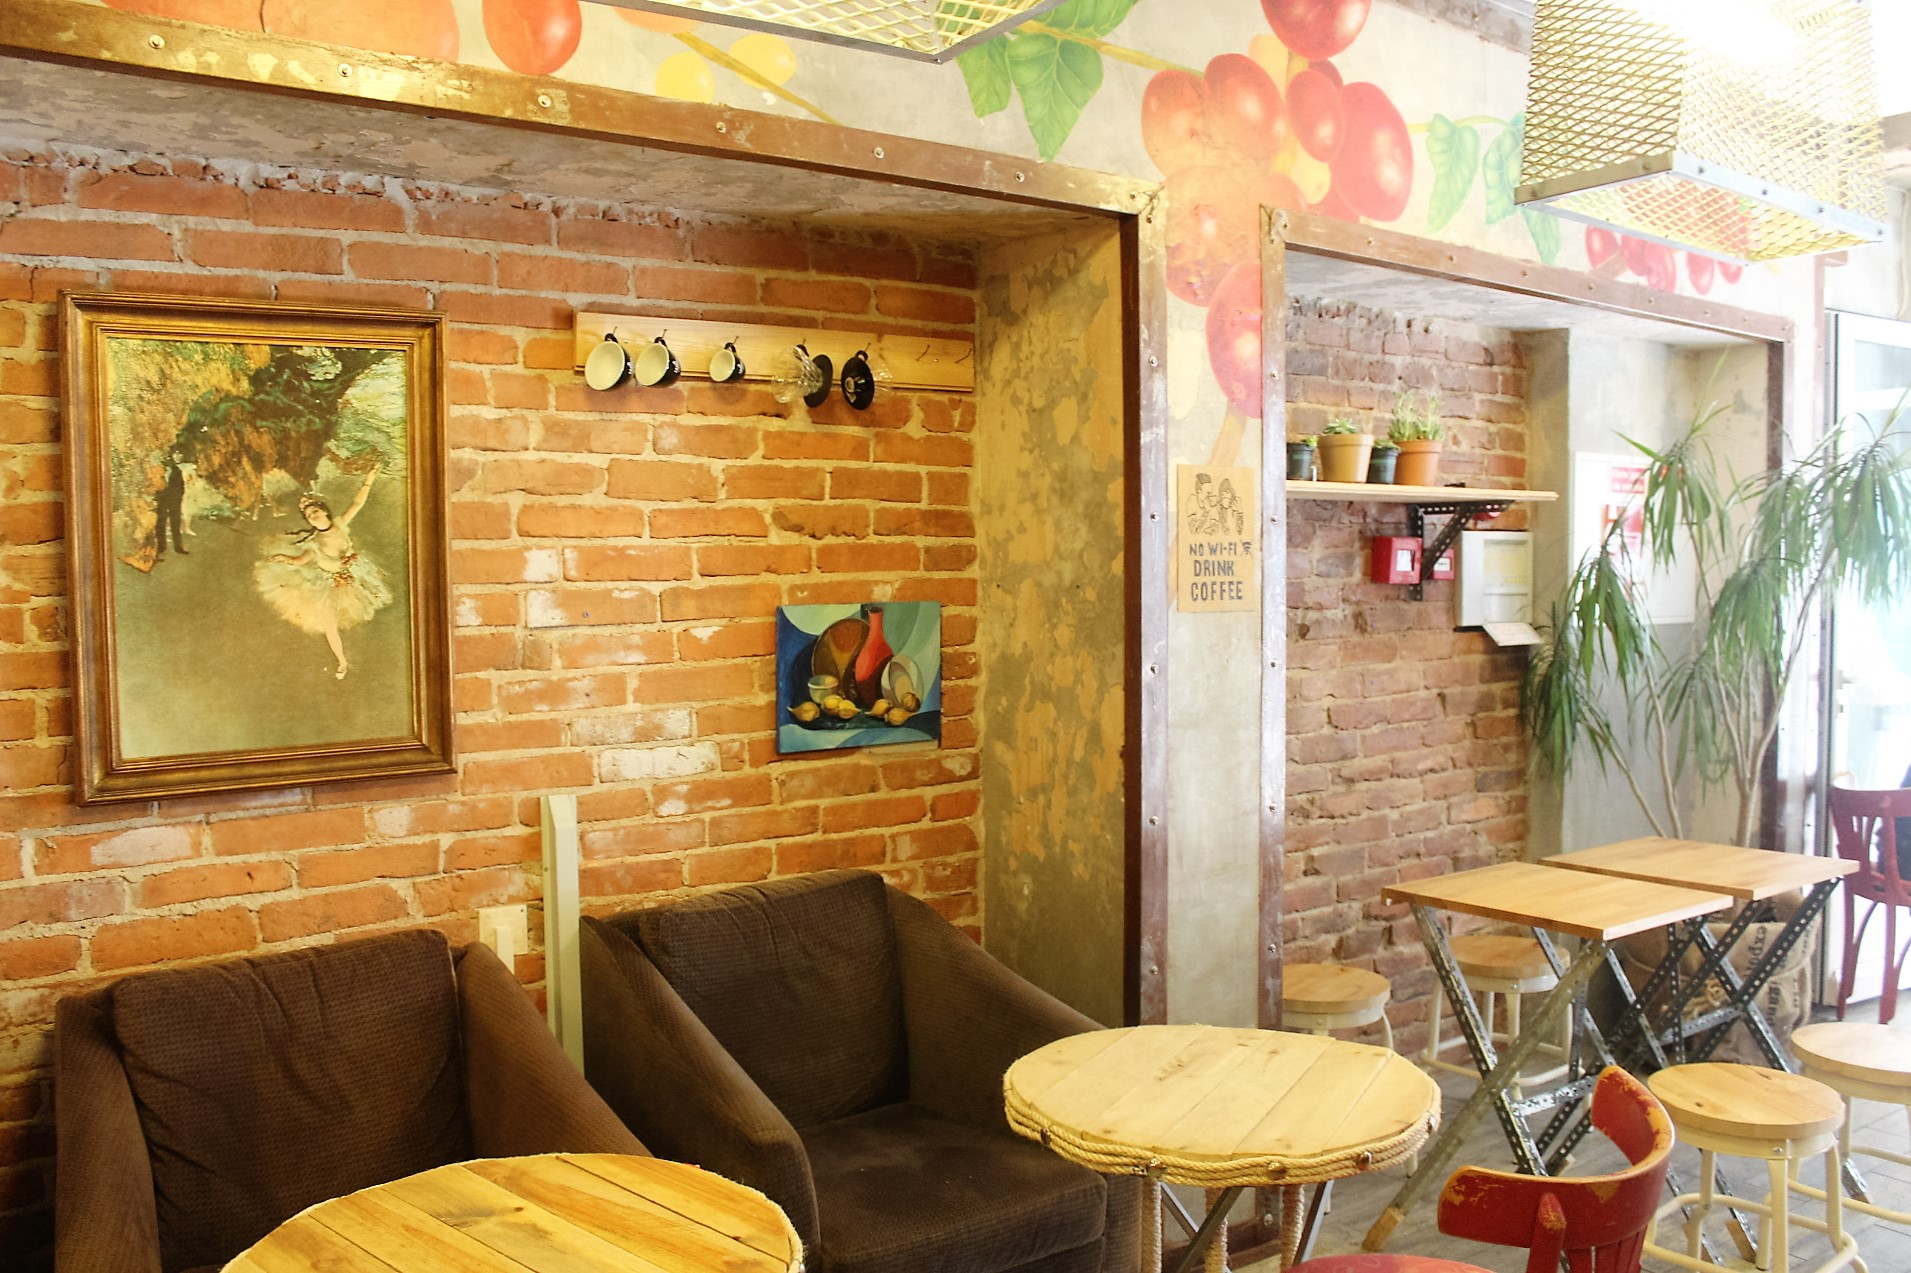 DIY Café alle Möbel selbst gemacht